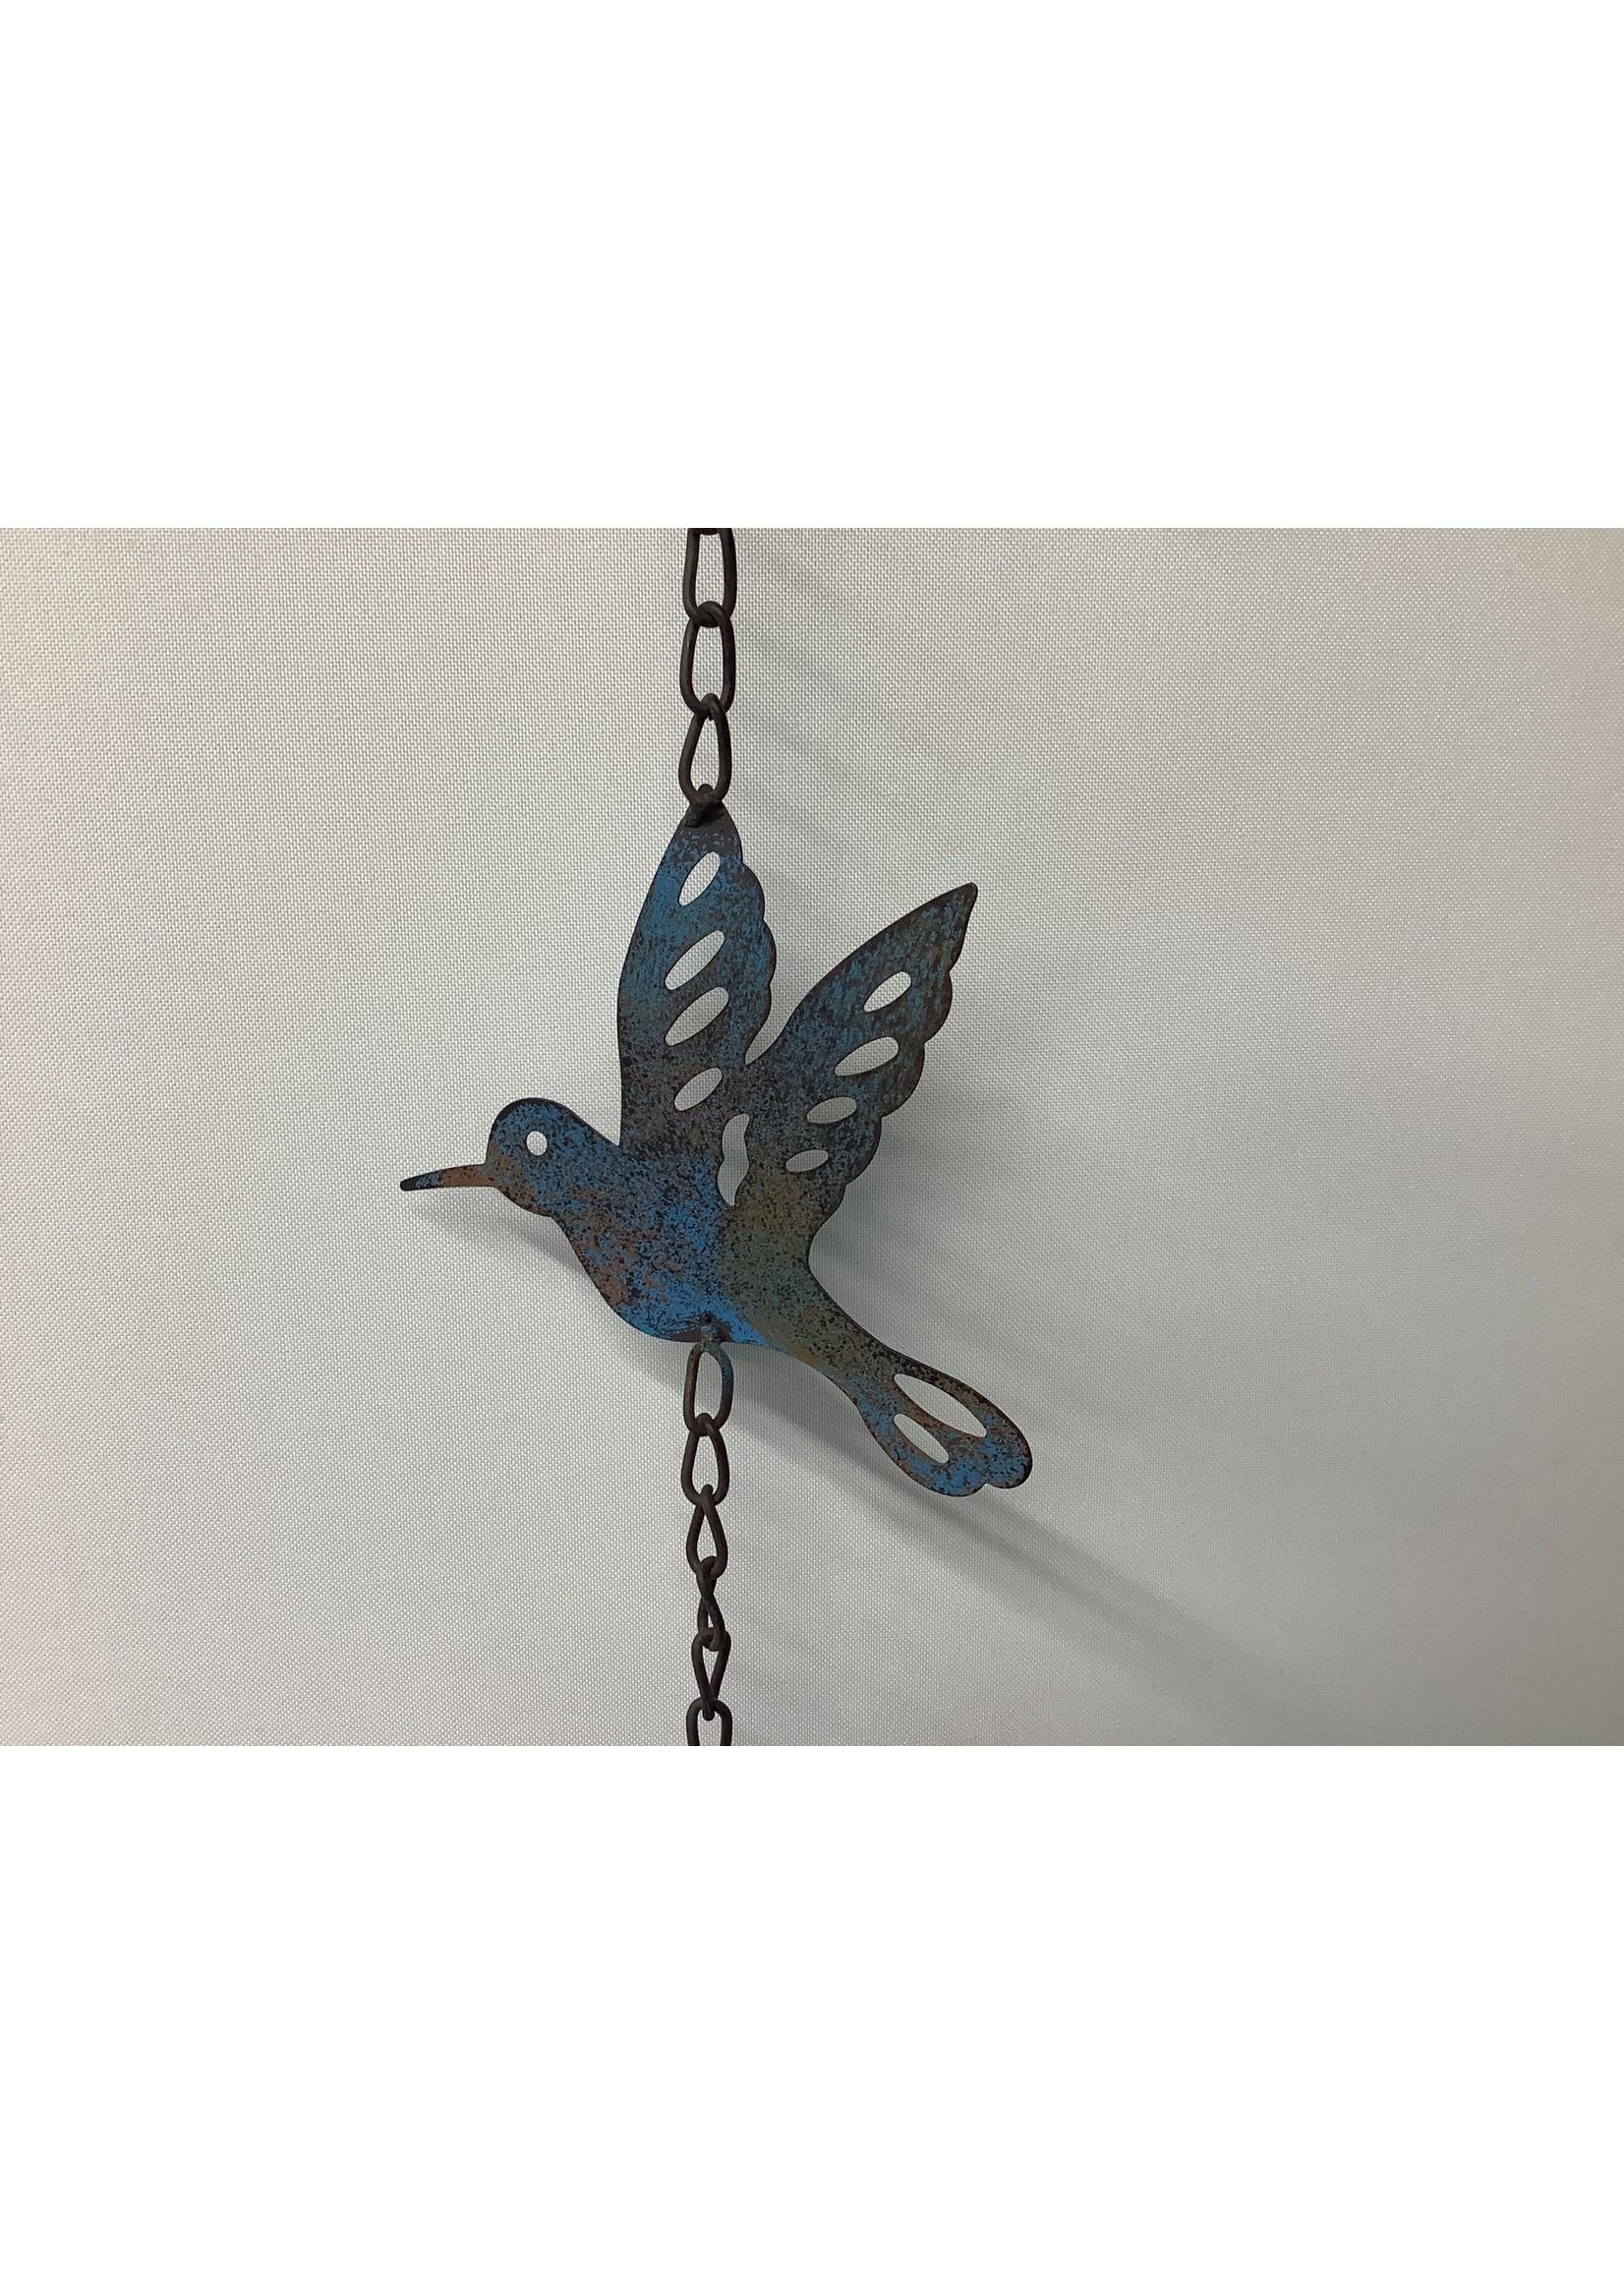 Bird Chain Metal 100cm long